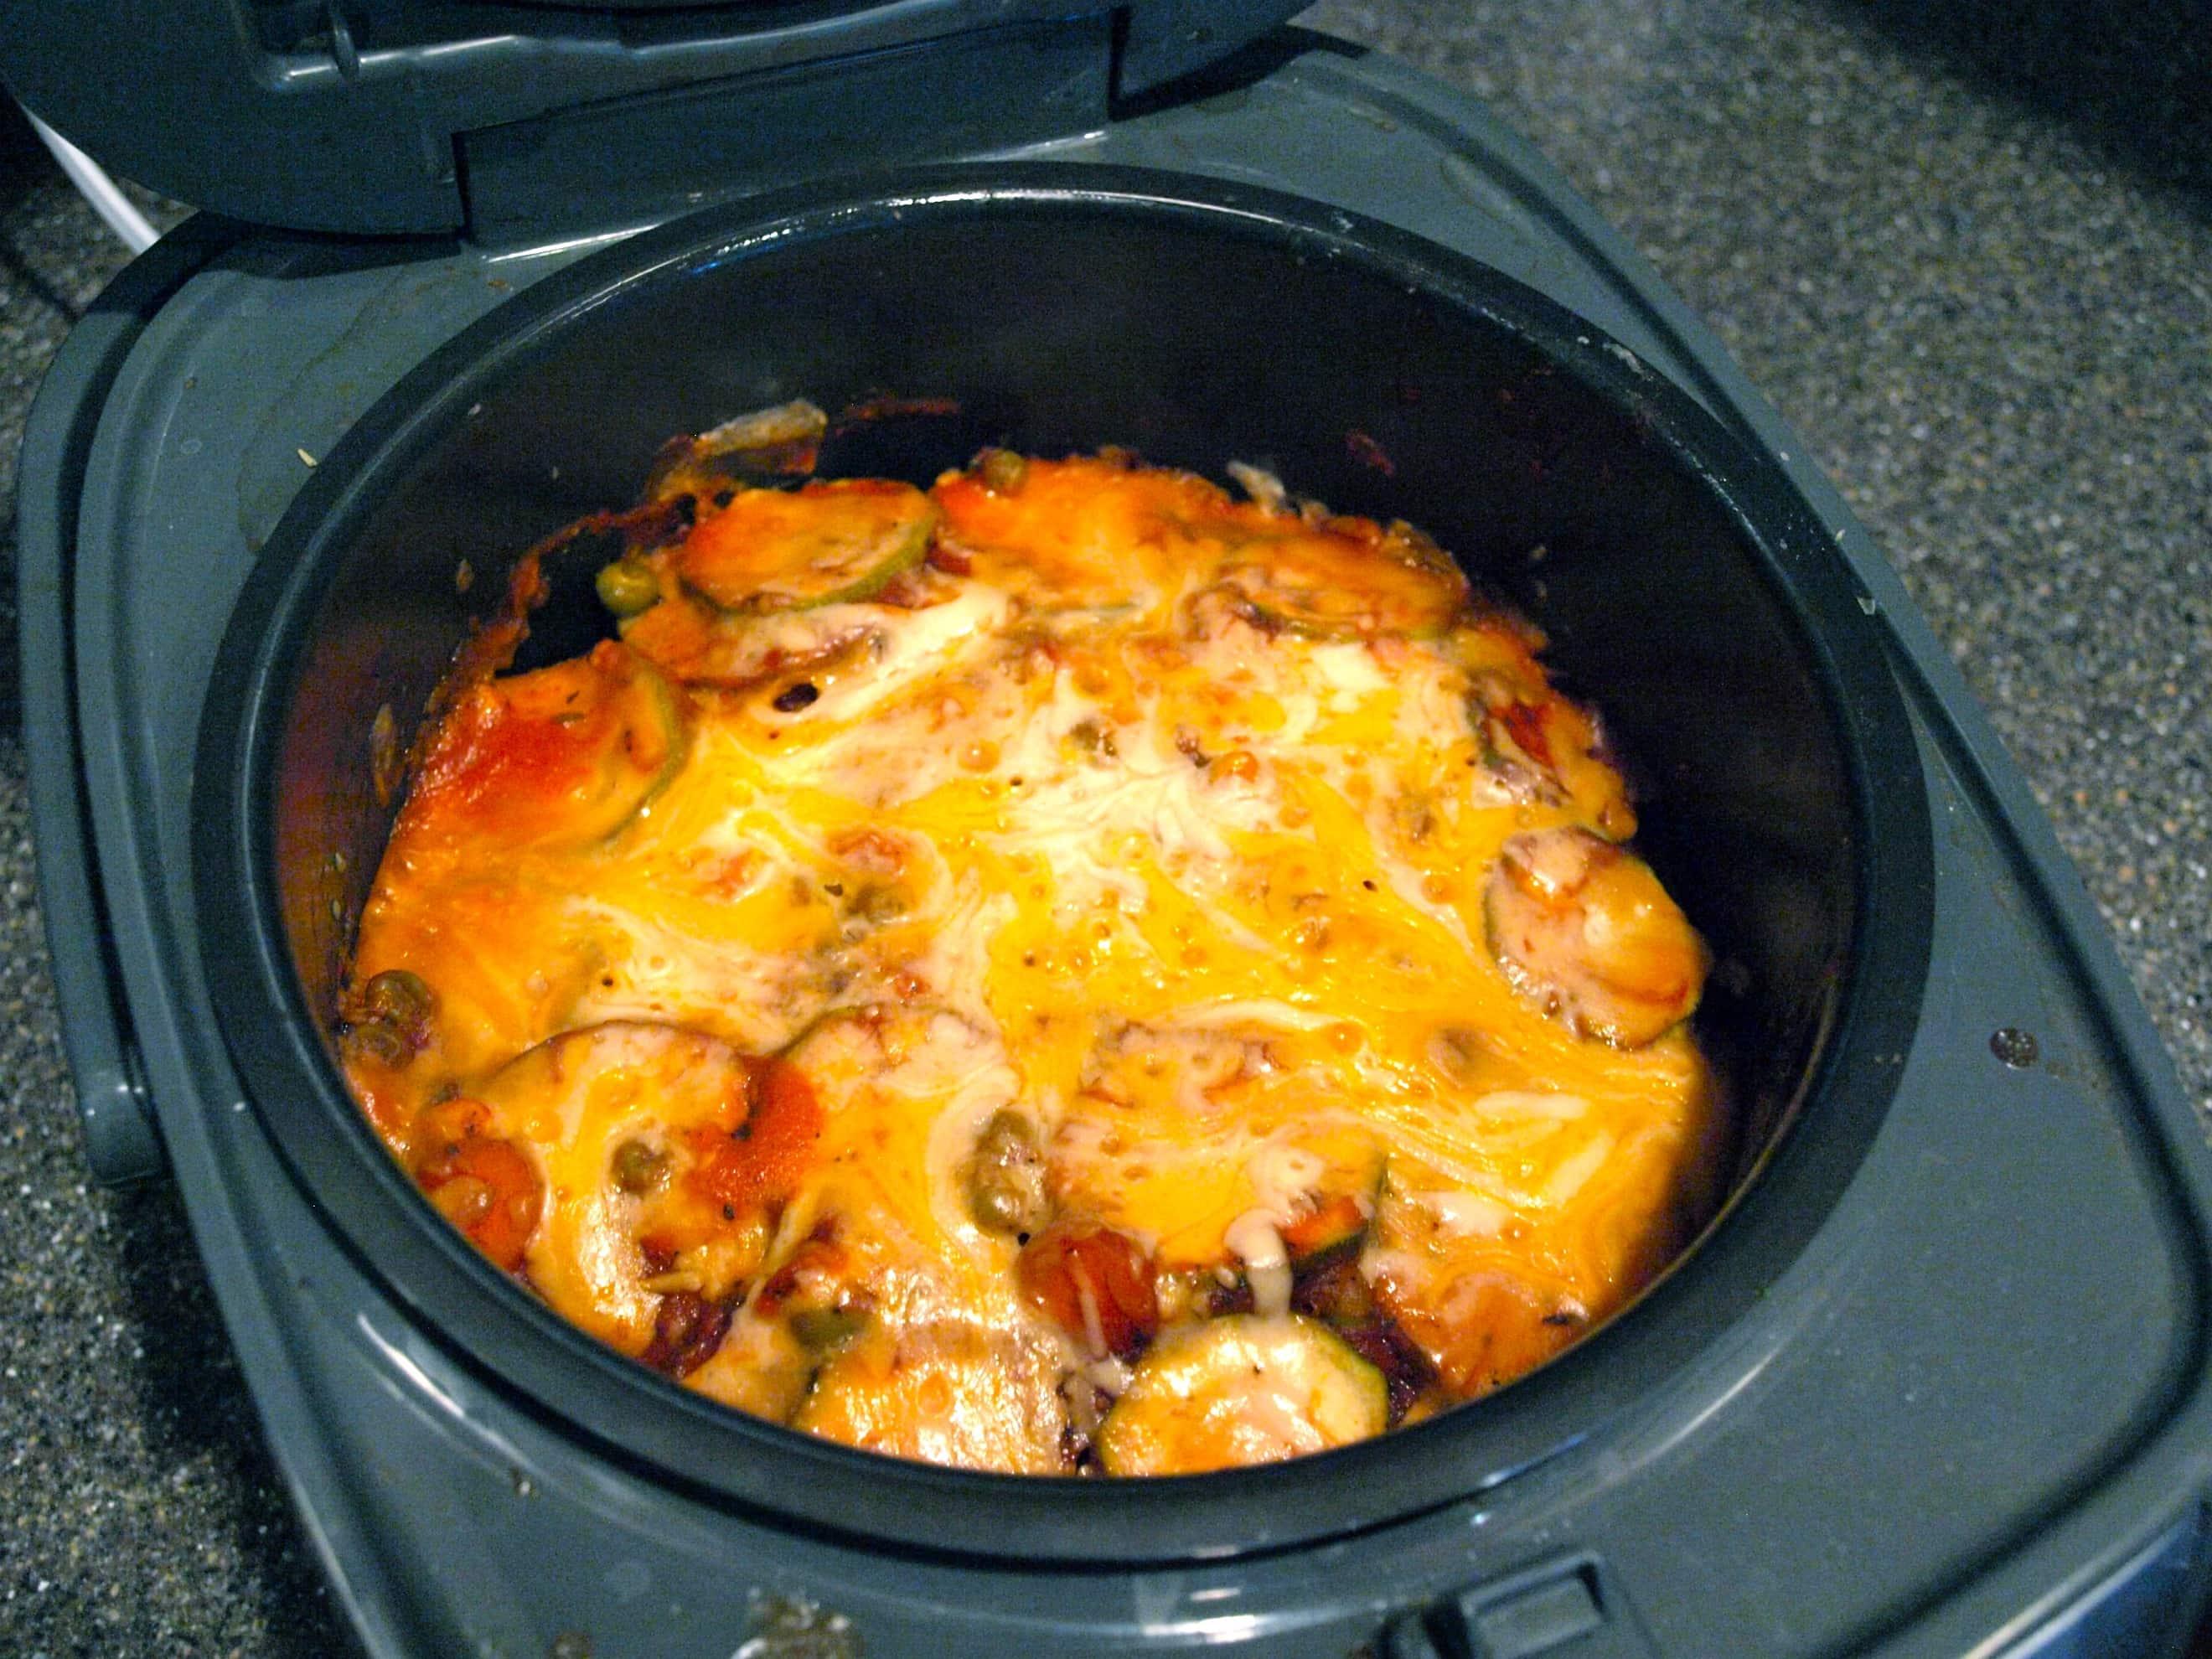 Layered Vegetable Crockpot Casserole